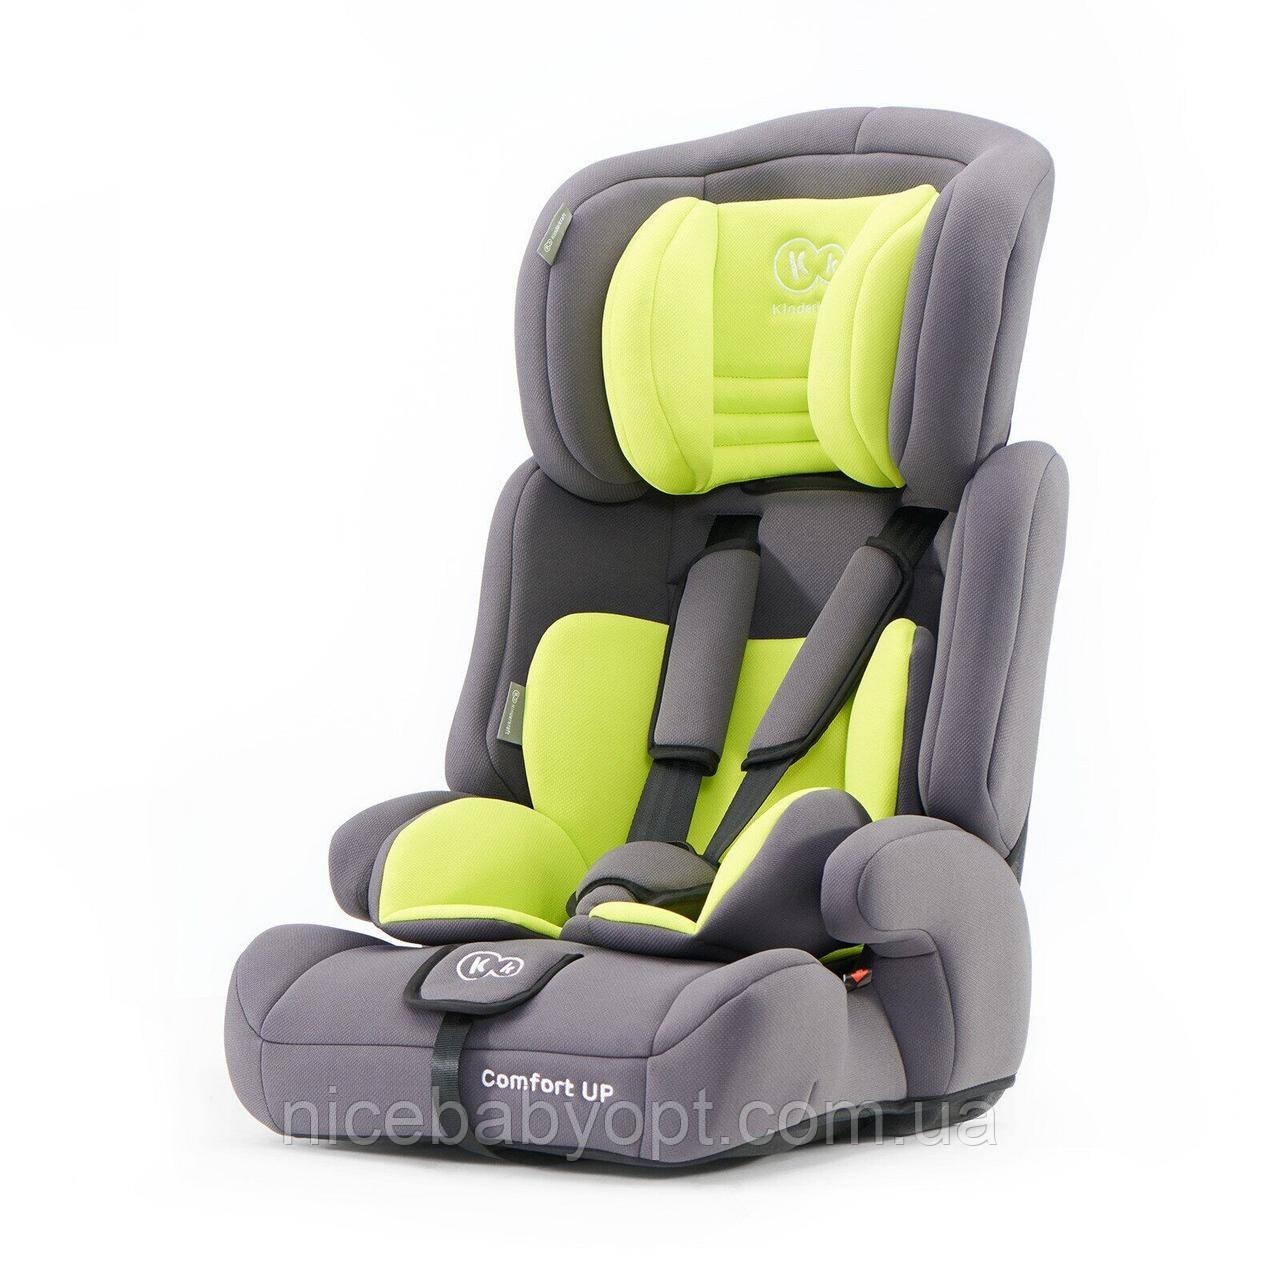 Автокрісло Kinderkraft Comfort Up Lime 9-36 кг (група 1-2-3)